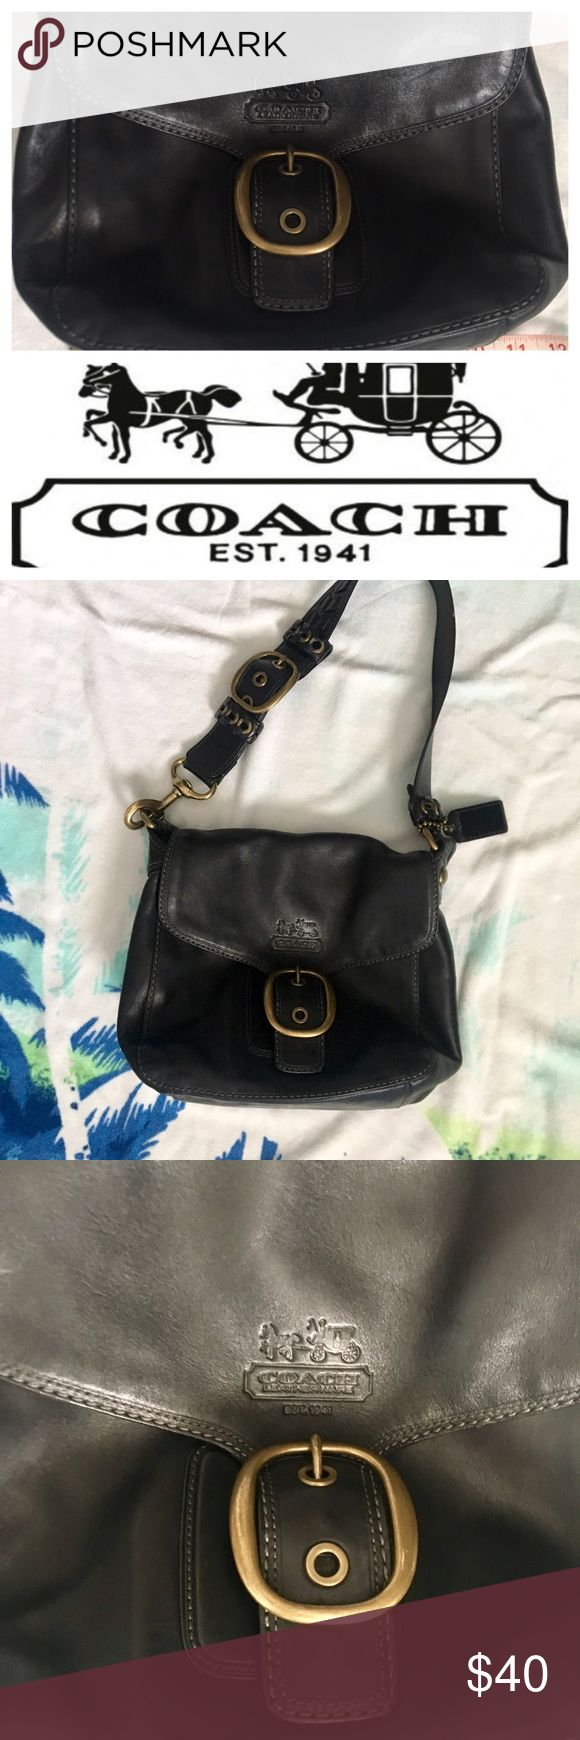 Vintage Black Coach Shoulder Bag EUC vintage black/charcoal bad.  Very little wear on bag.  See photos. Very good inside condition. Coach Bags Shoulder Bags